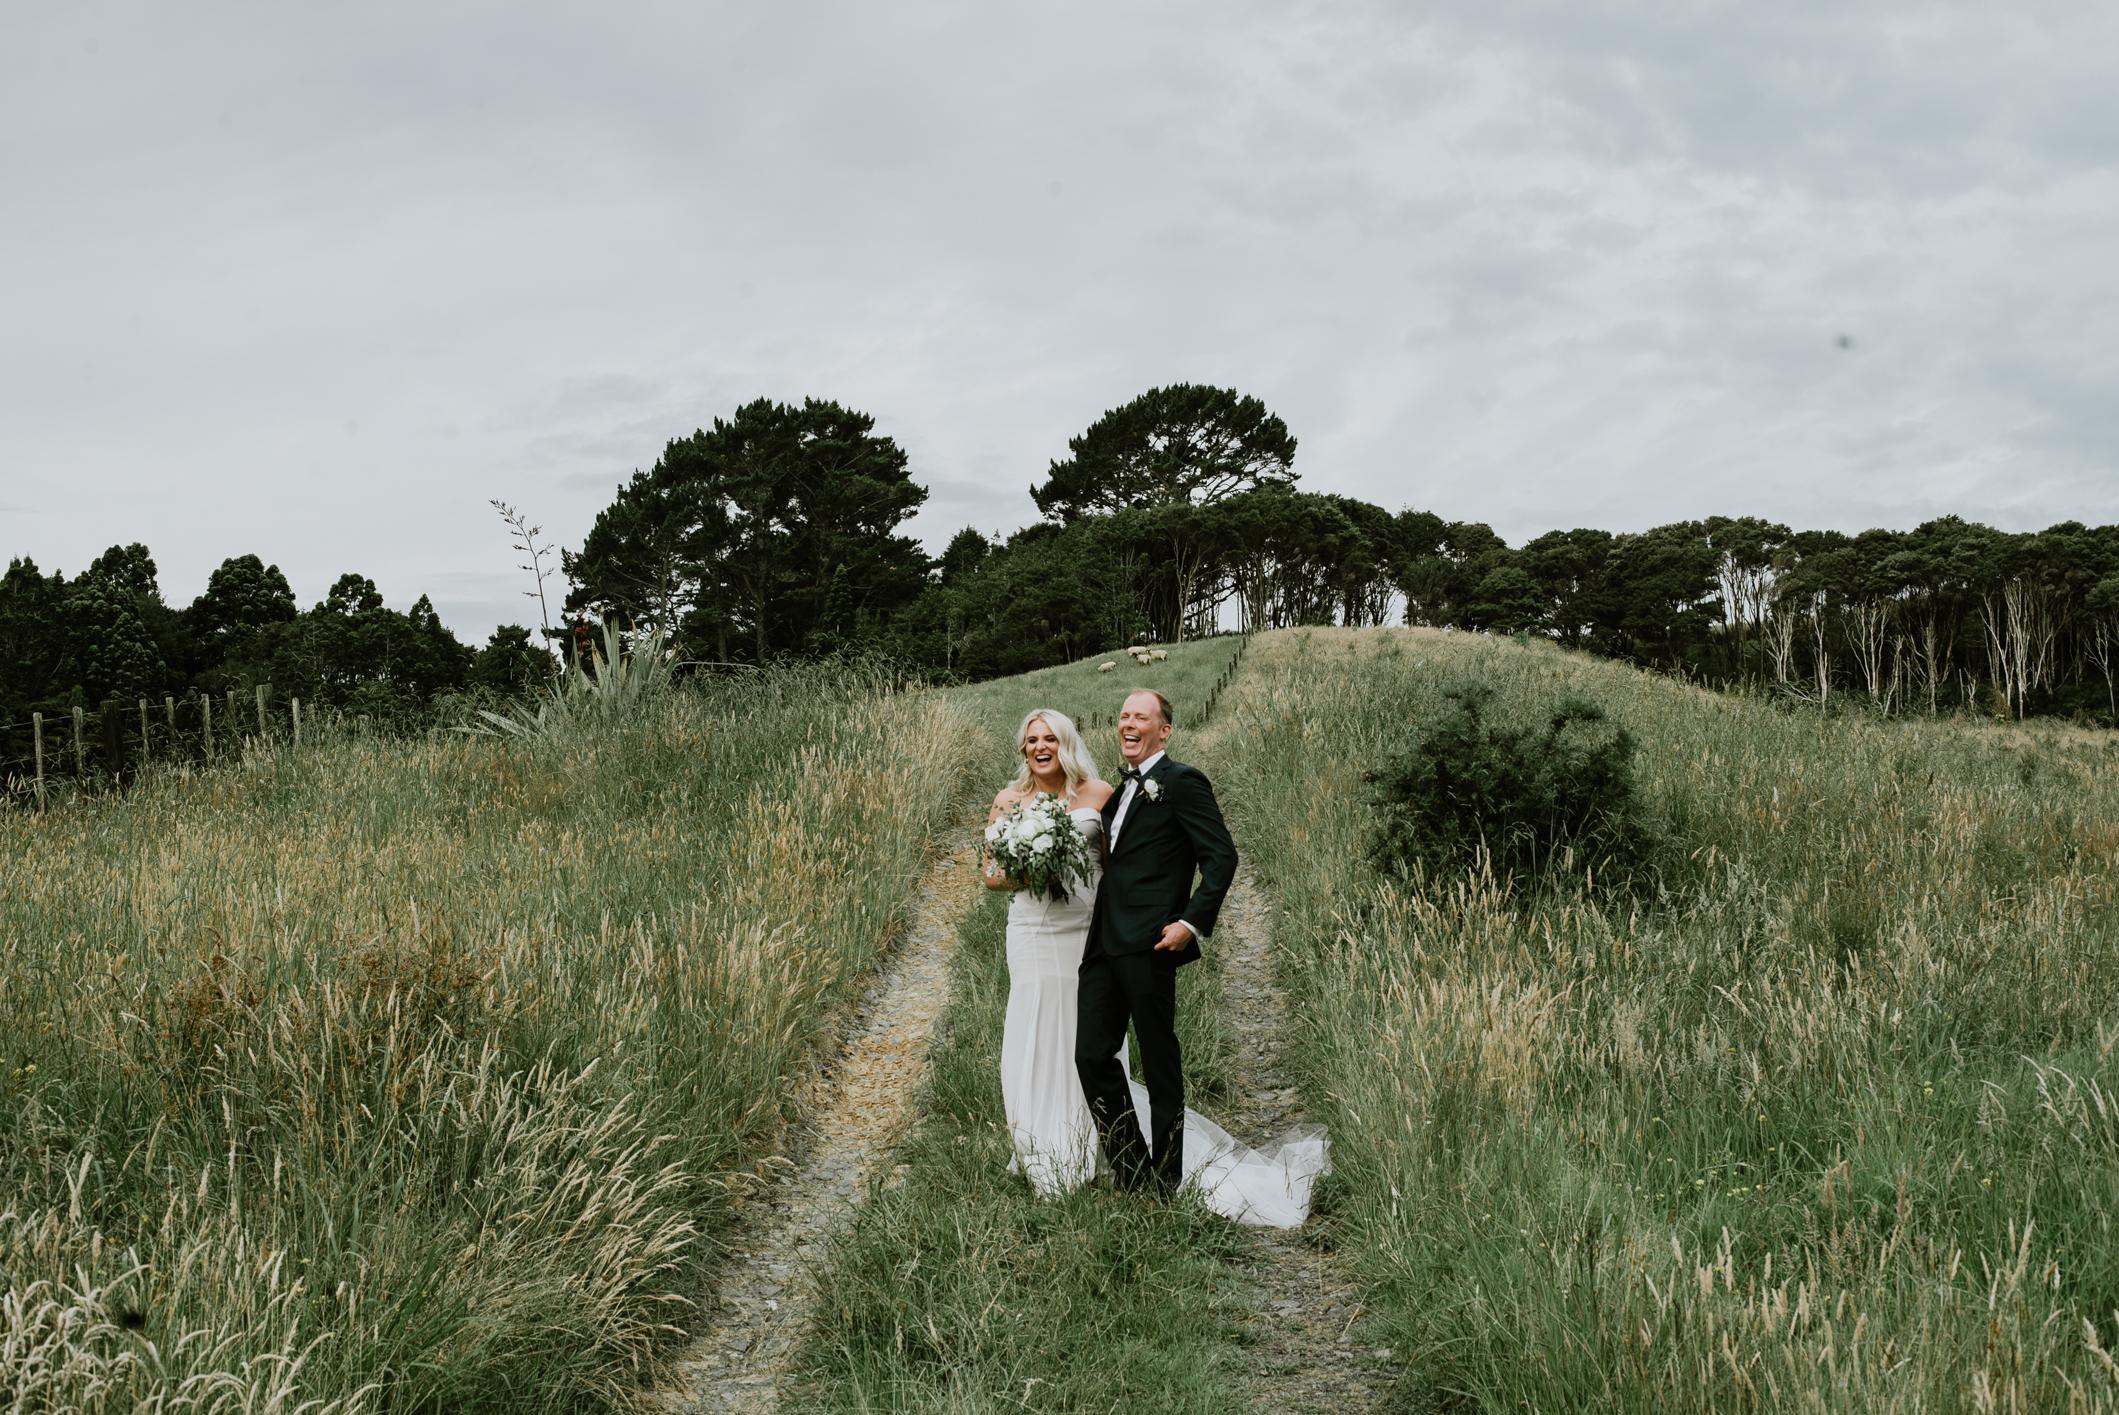 Gabes-jarrod-wedding-video.jpg